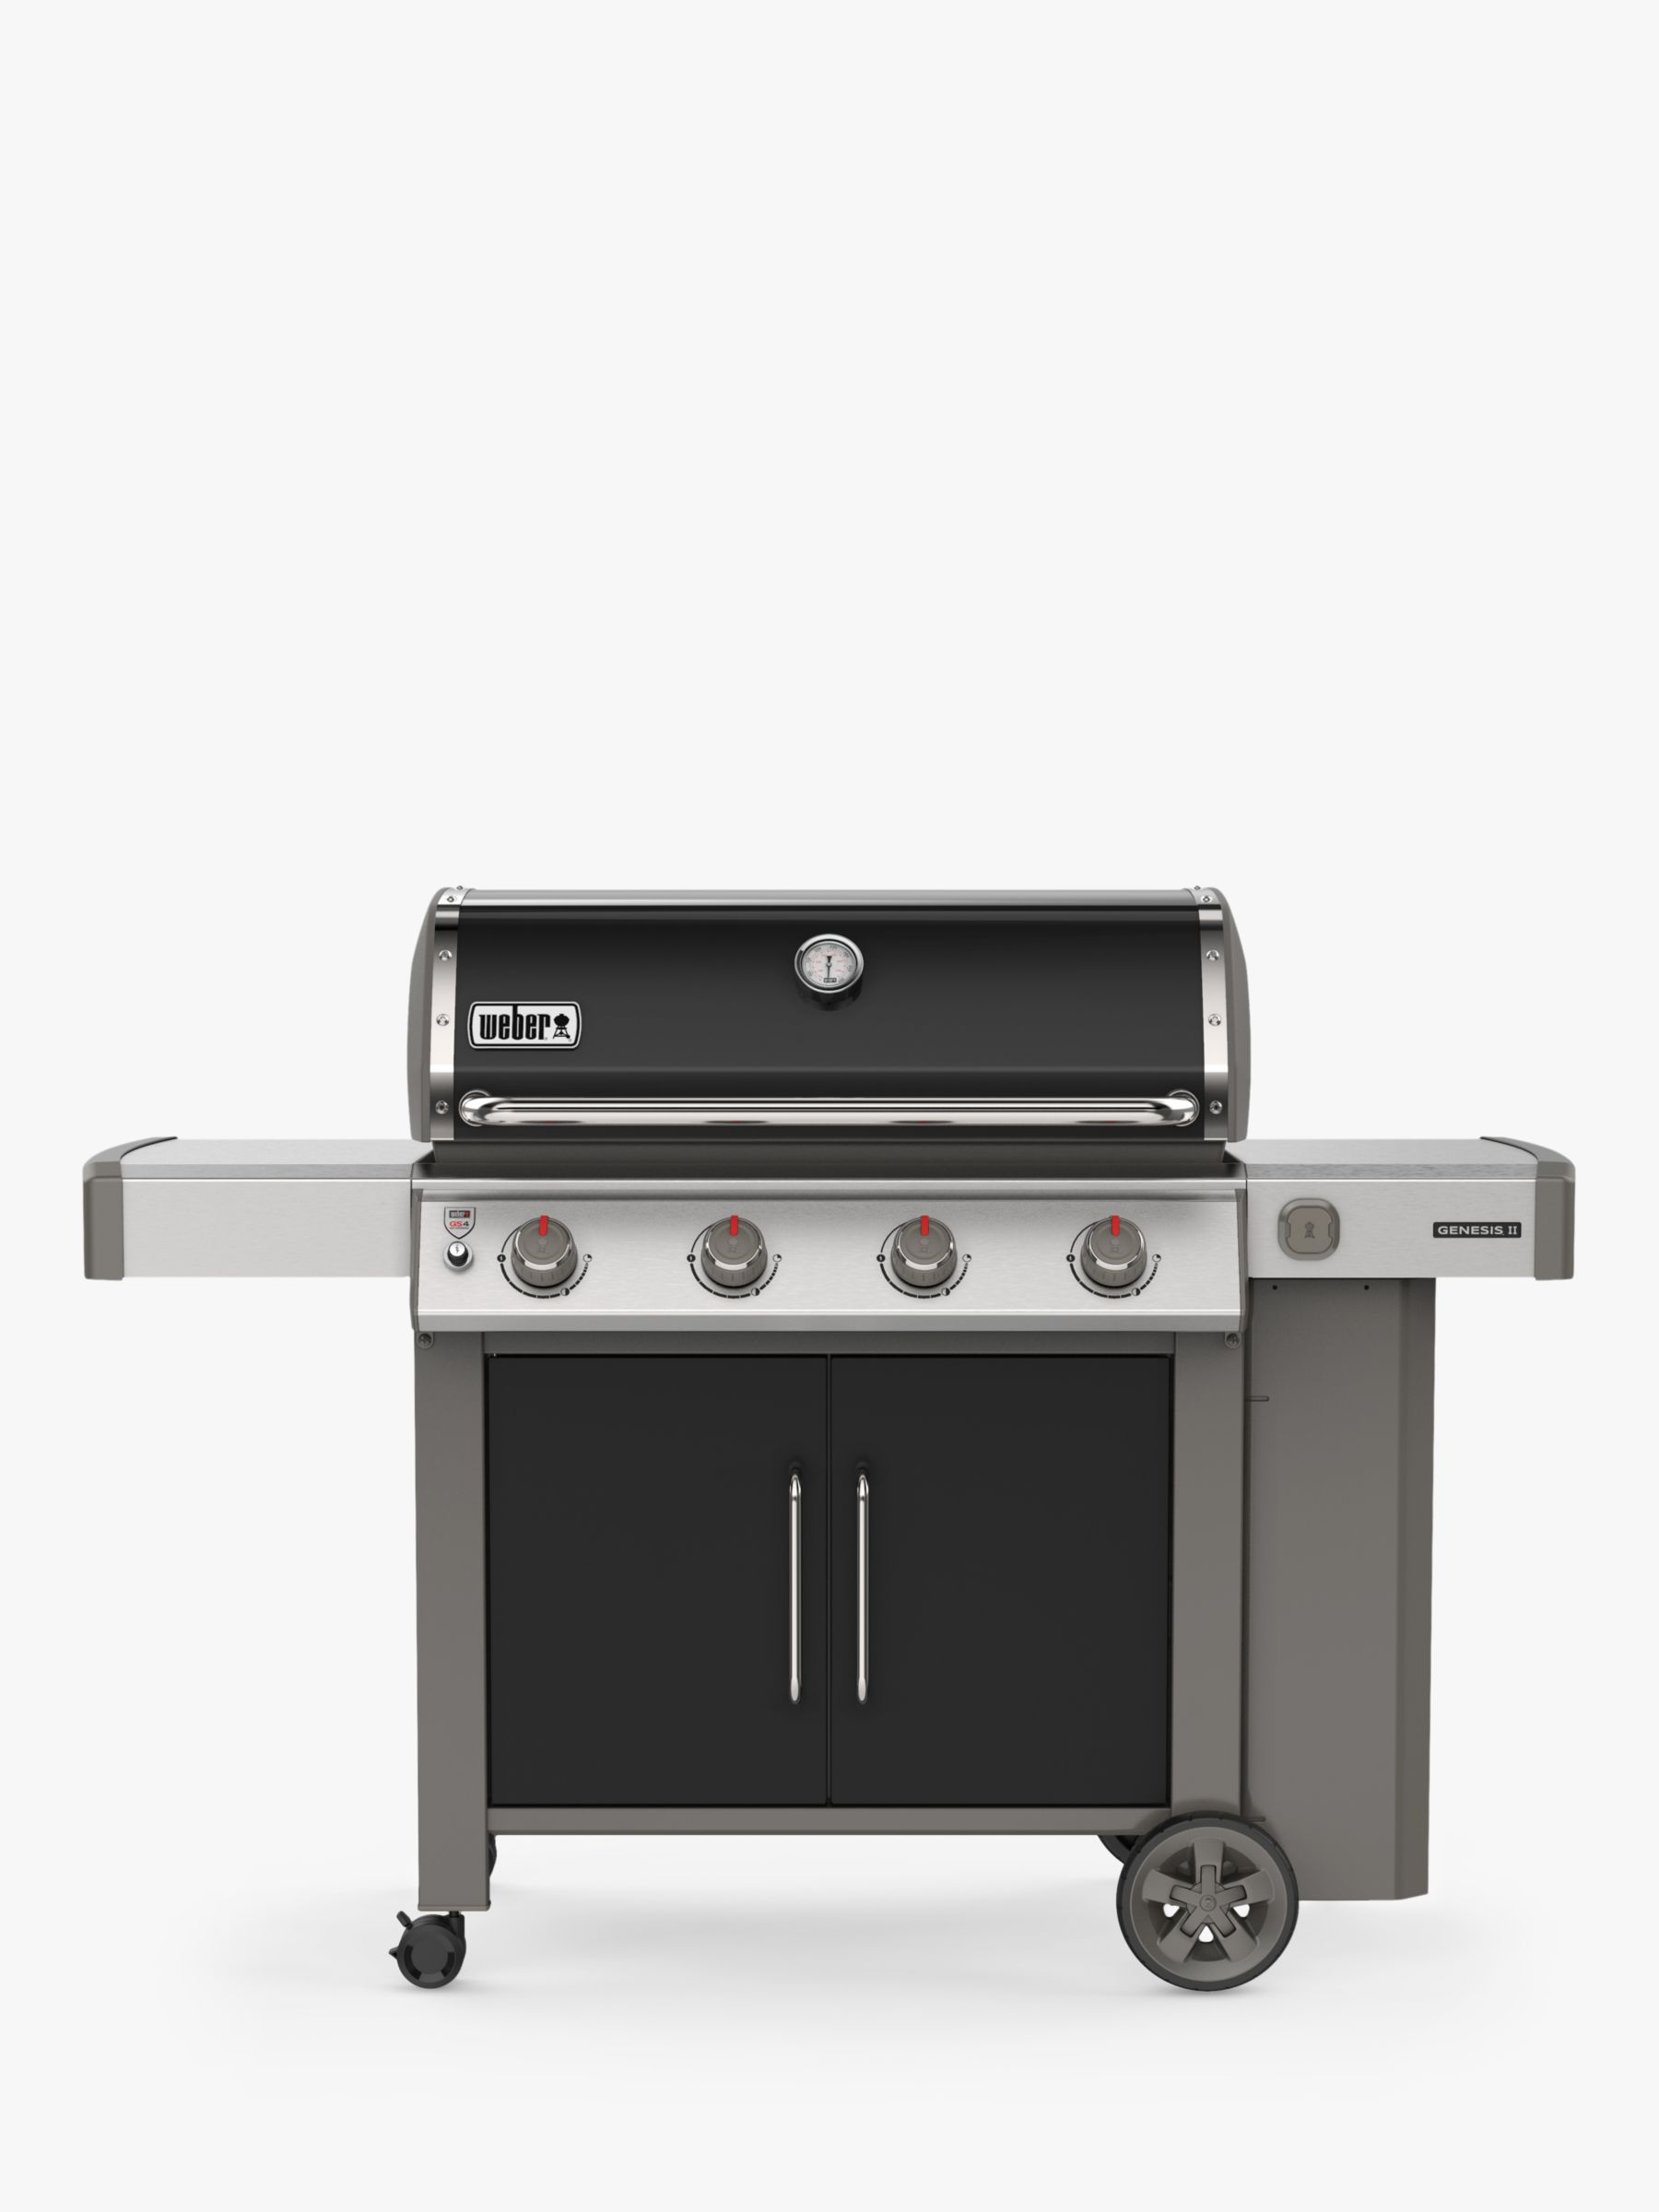 Weber Weber Genesis II E-415 4-Burner Gas BBQ, Black